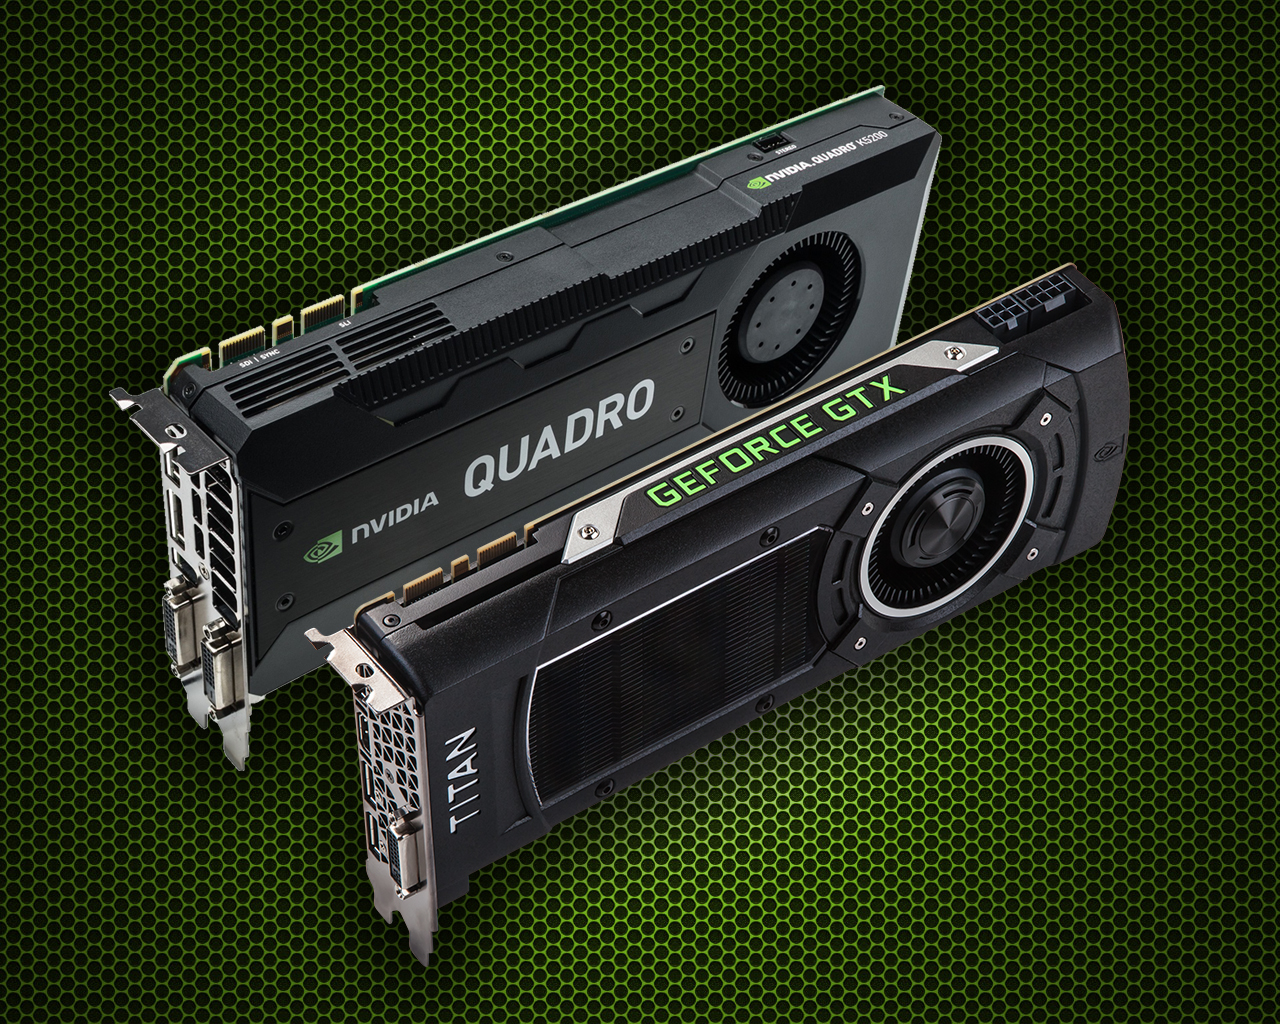 VIDIA Graphics Cards: Quadro vs. GeForce